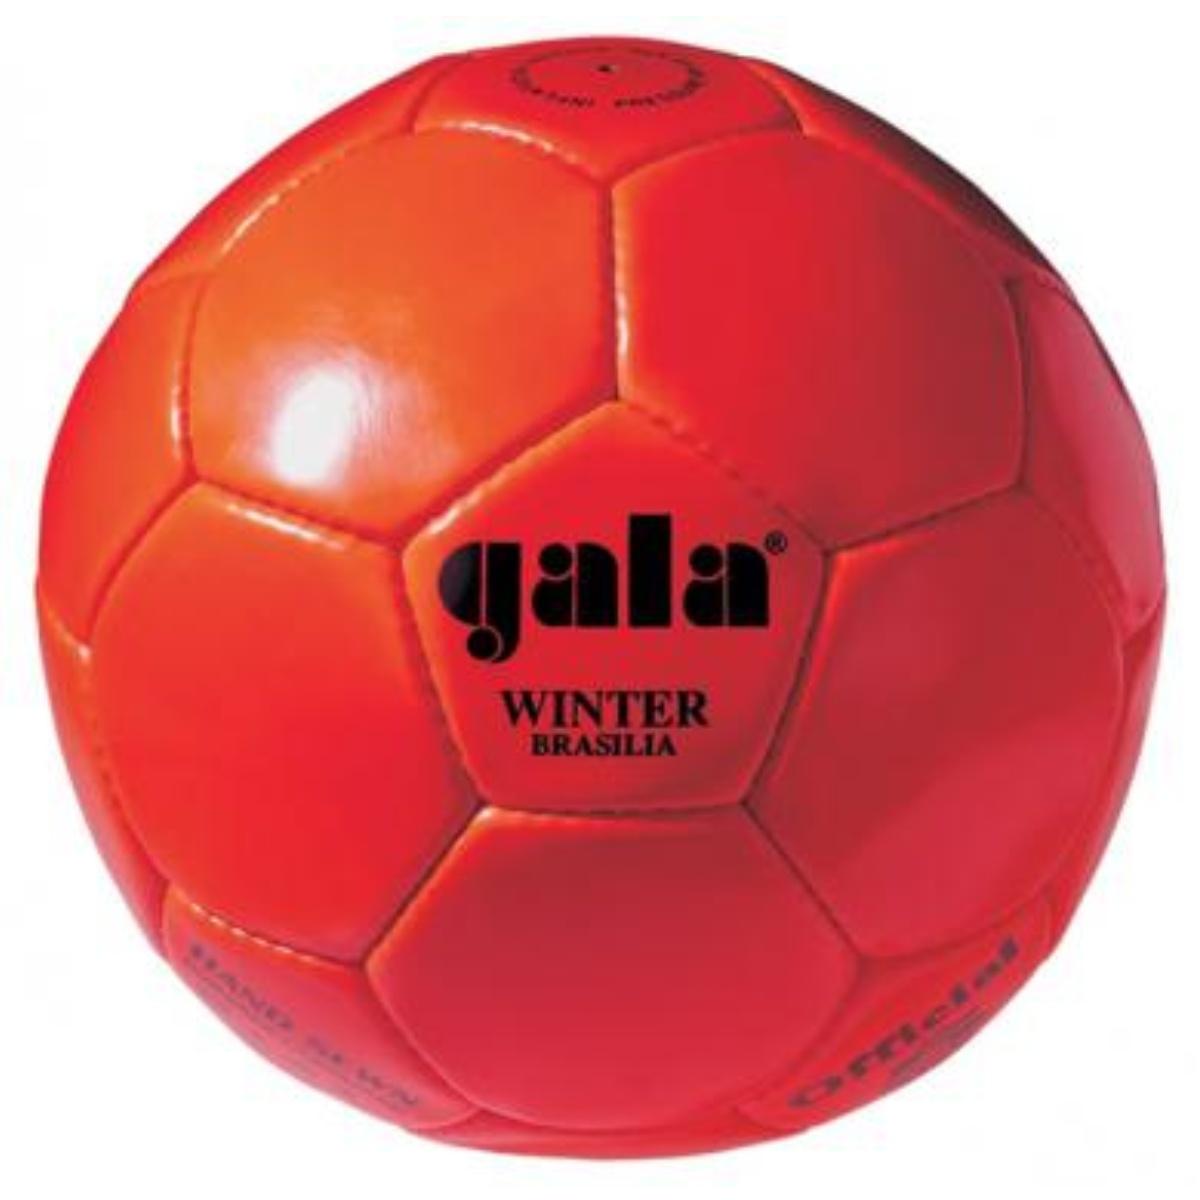 Fotbalový míč GALA Brasilia Winter BF5043S